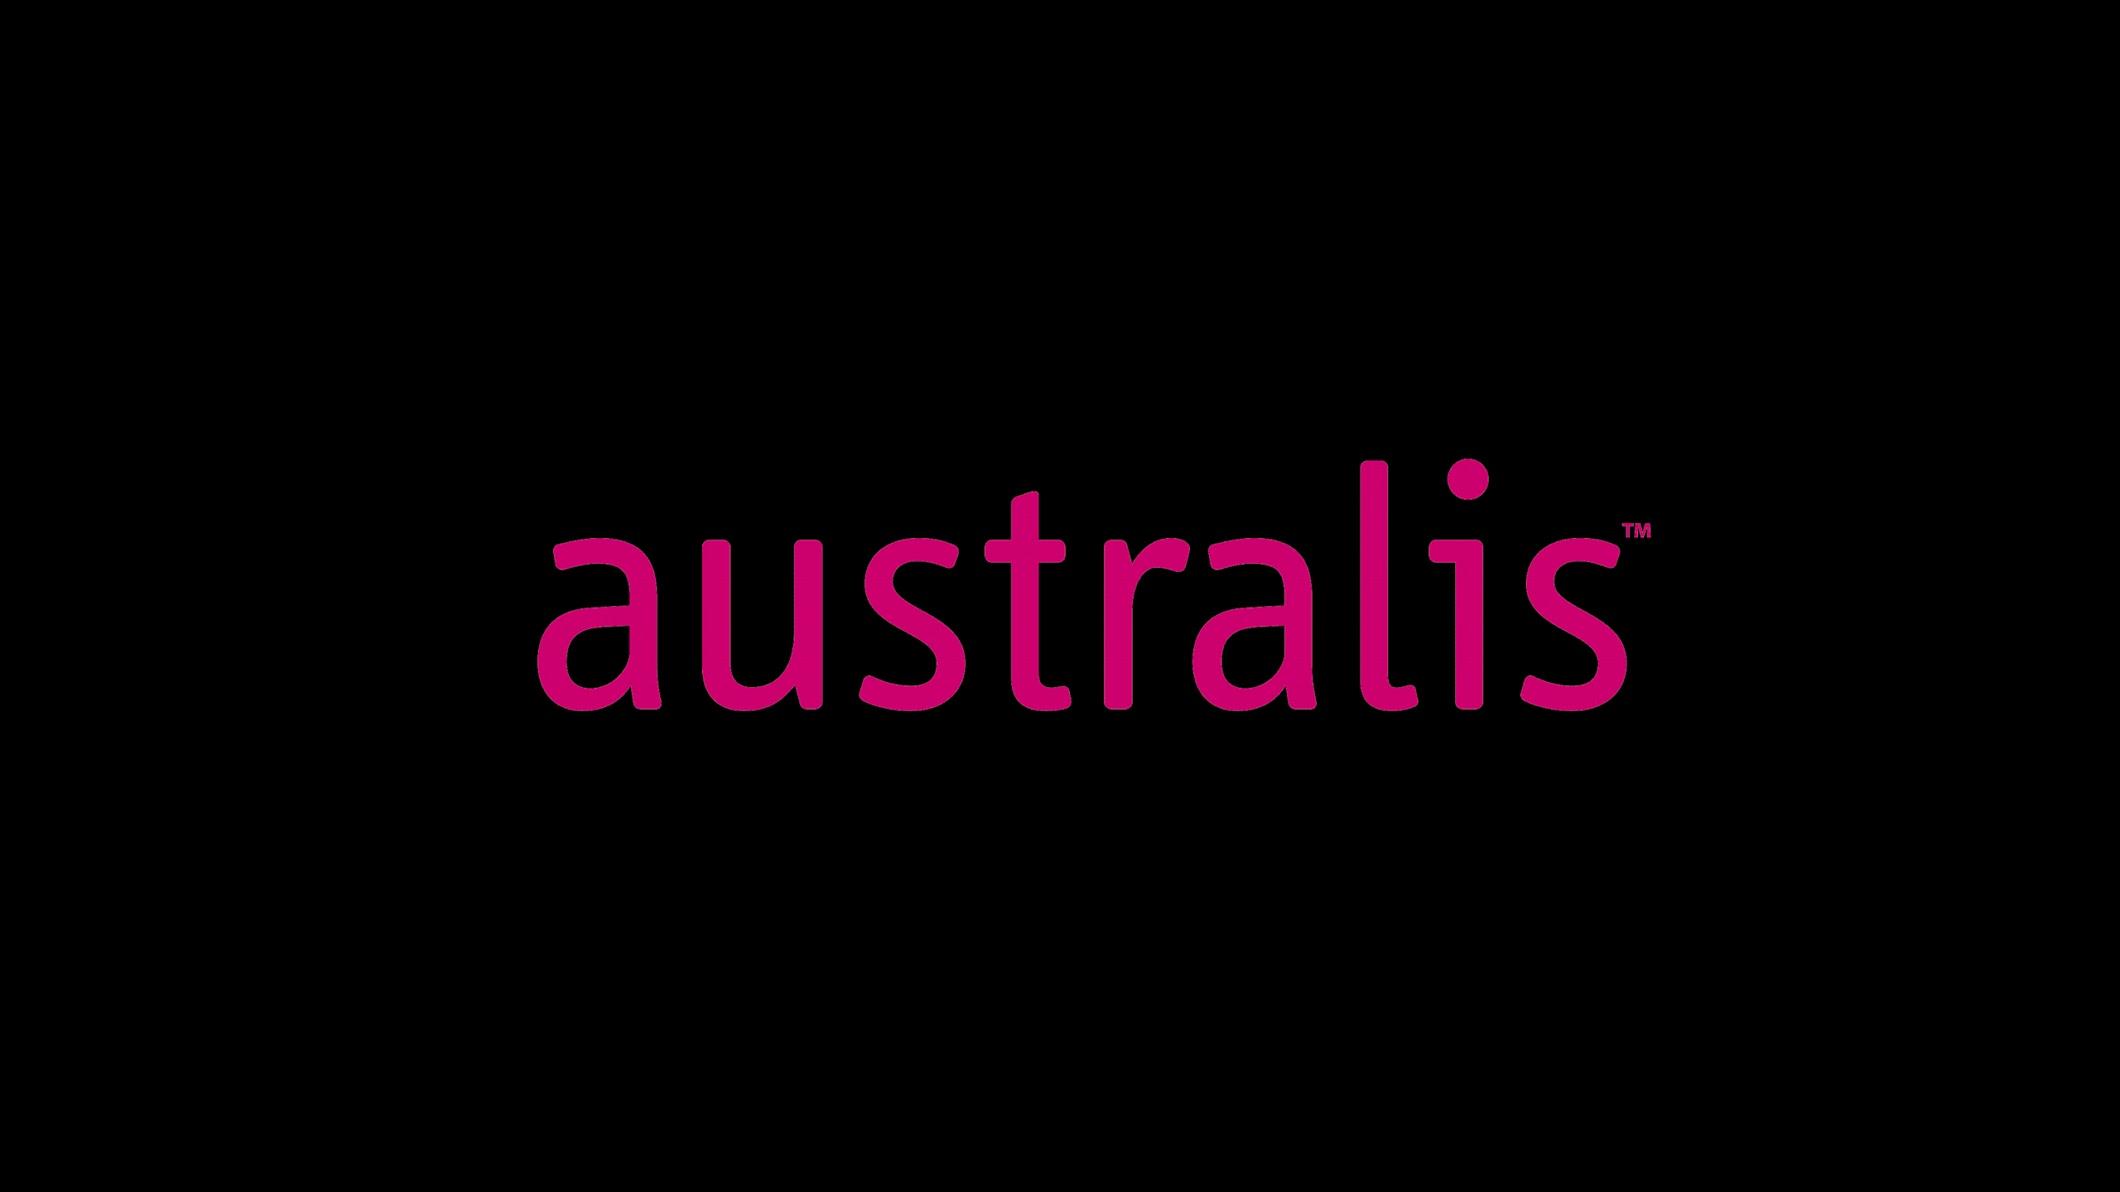 How to Video's on Australis Cosmetics